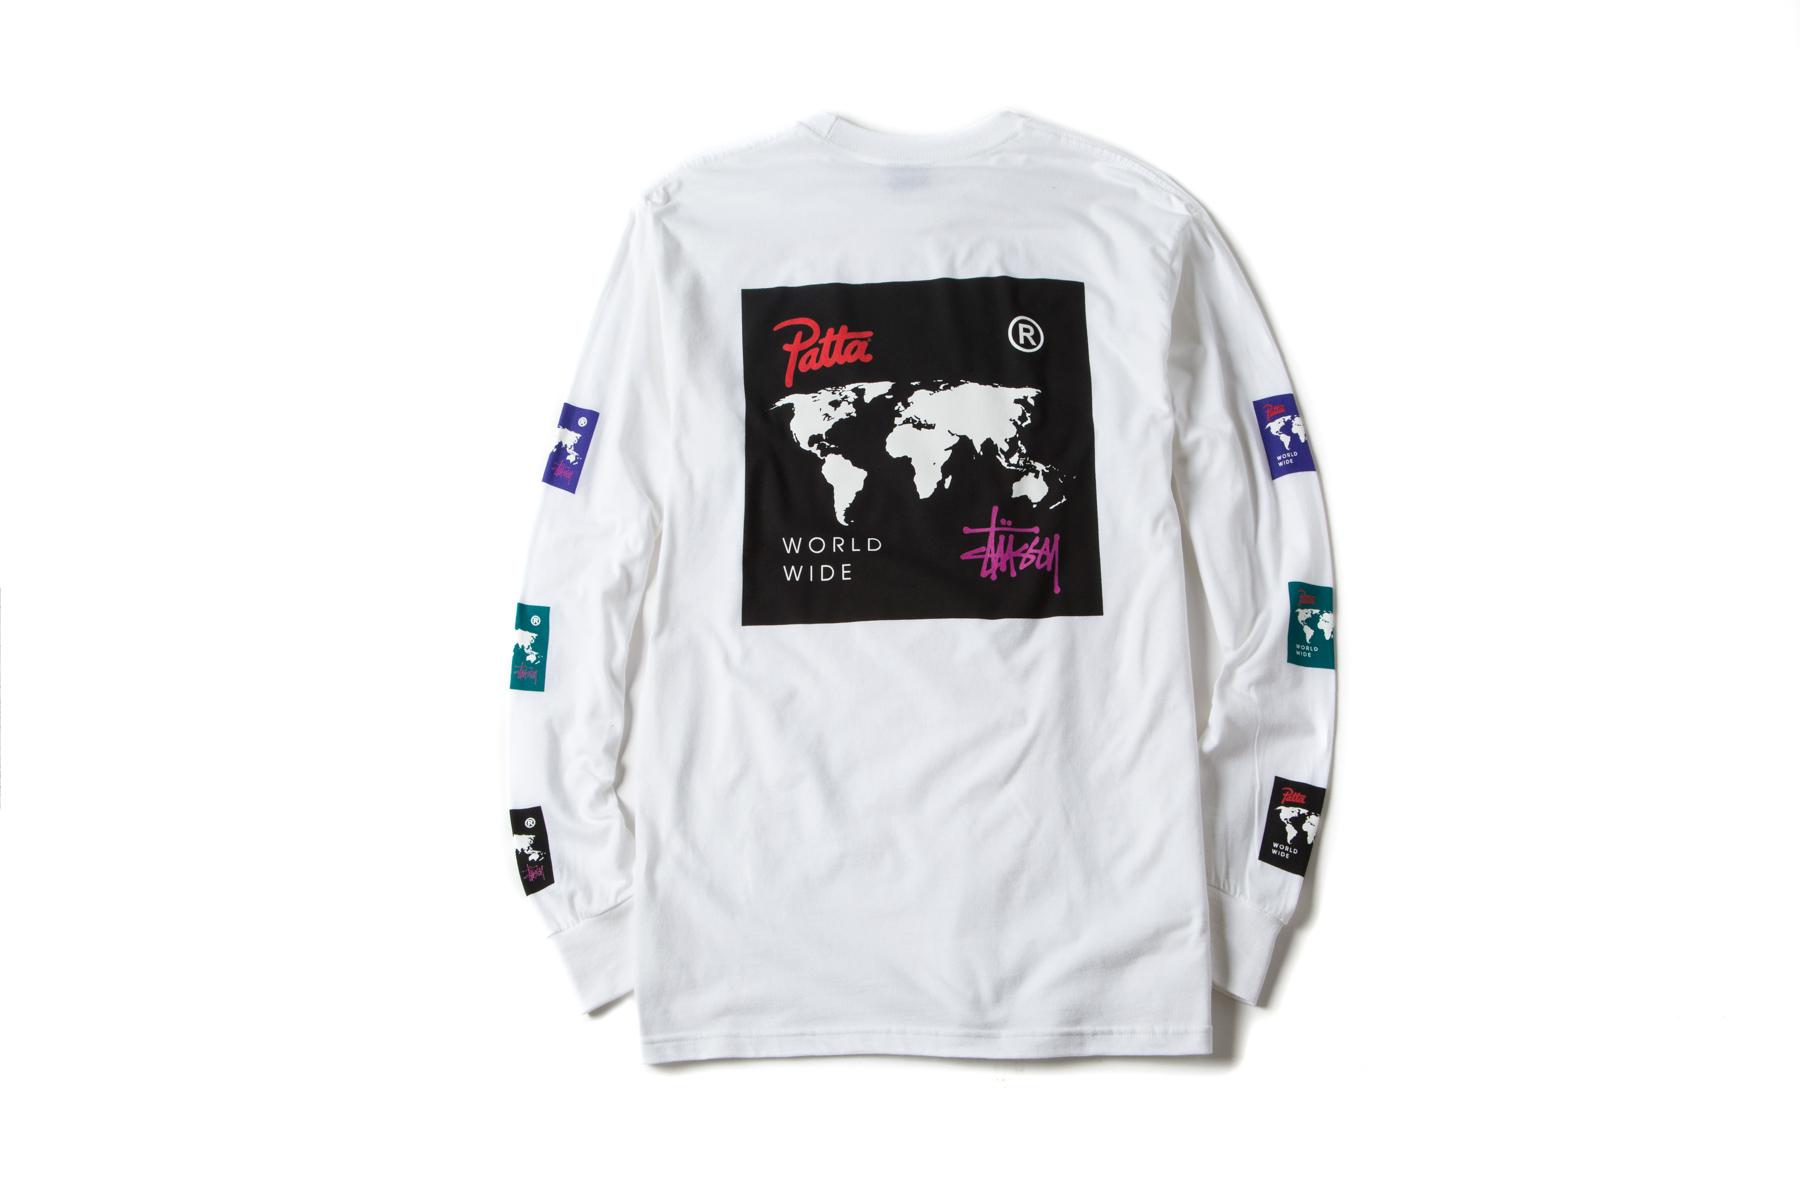 Stussy clothing sale online